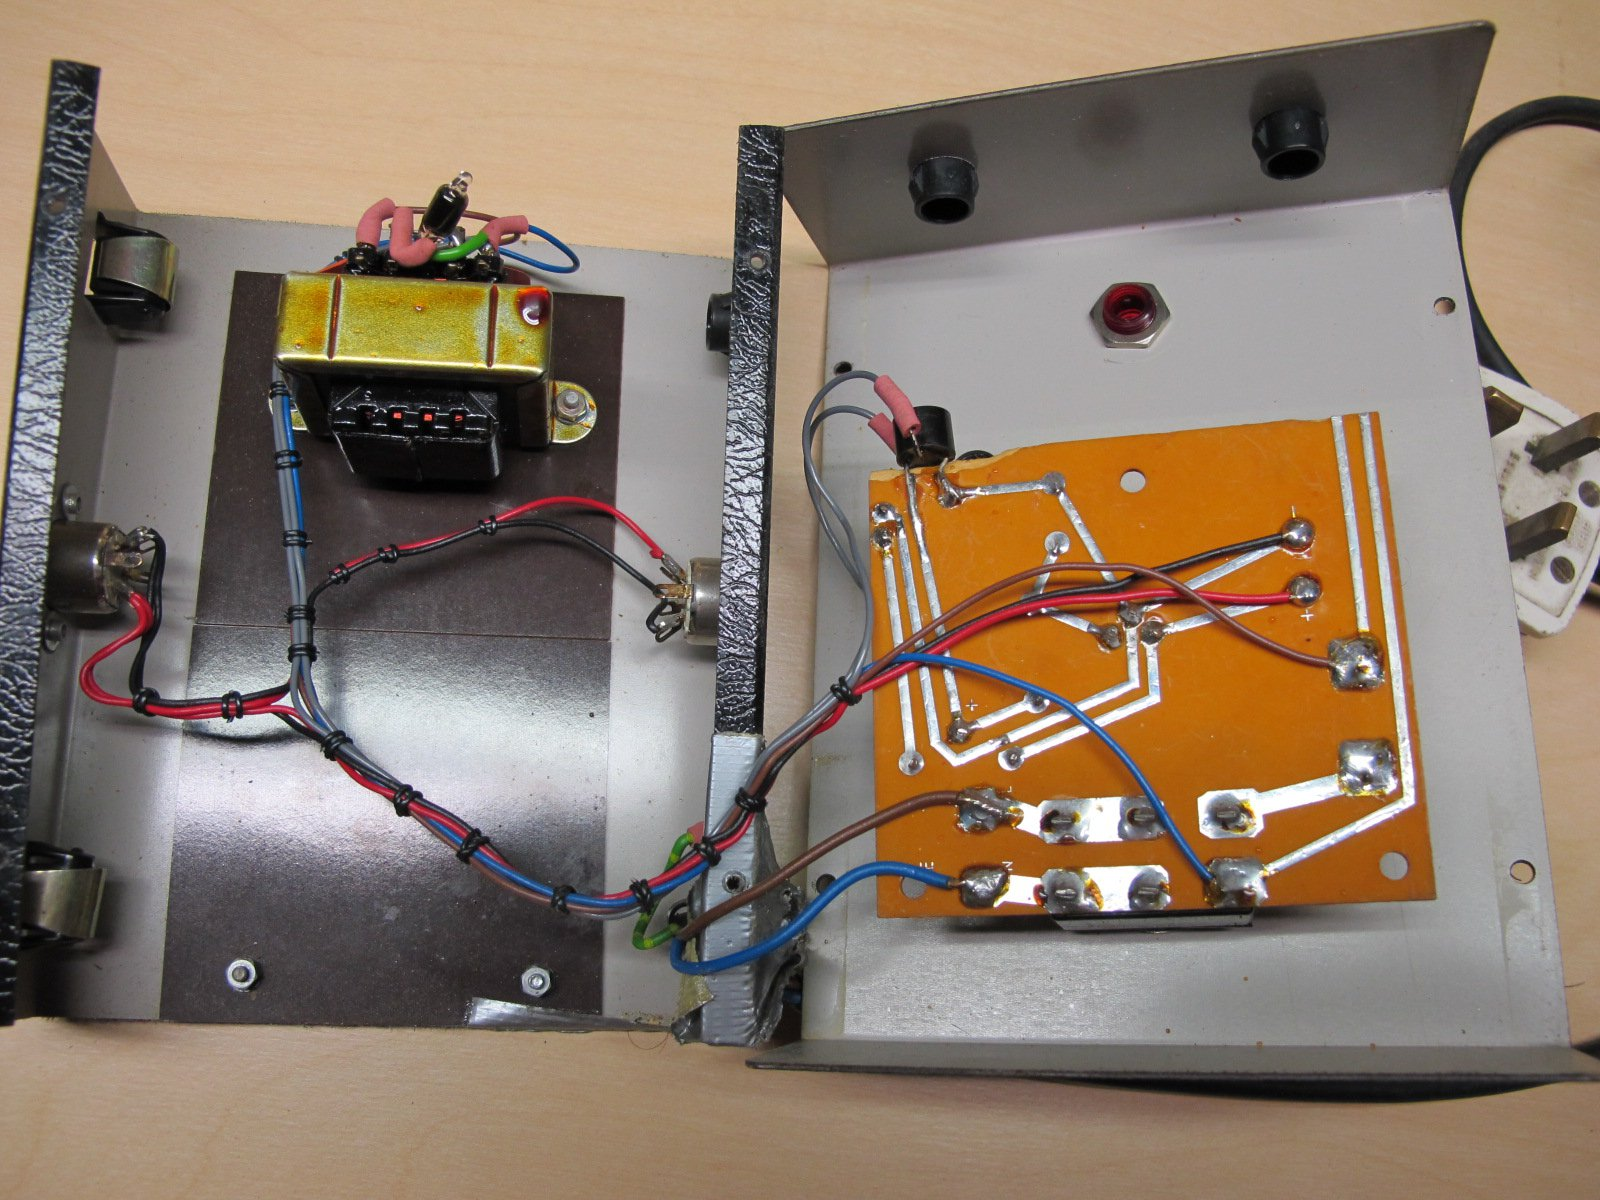 1977 82 Bell Electrolabs Module System Black Guitars Electronic Circuit